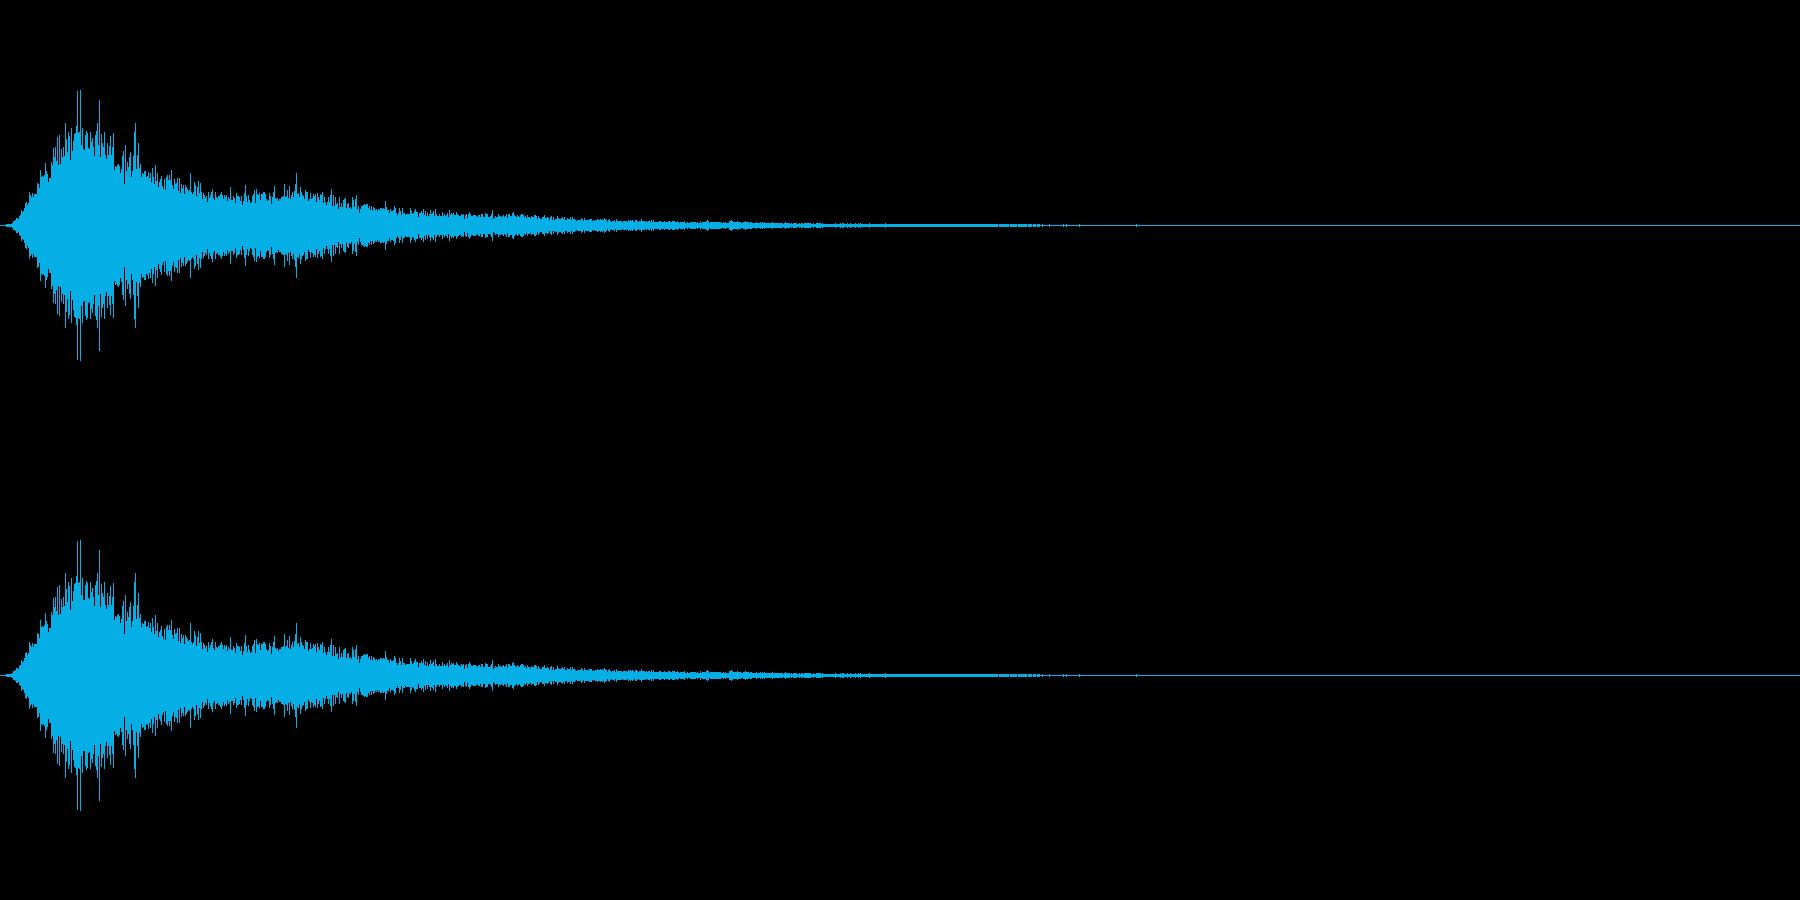 SF 移動音 9の再生済みの波形